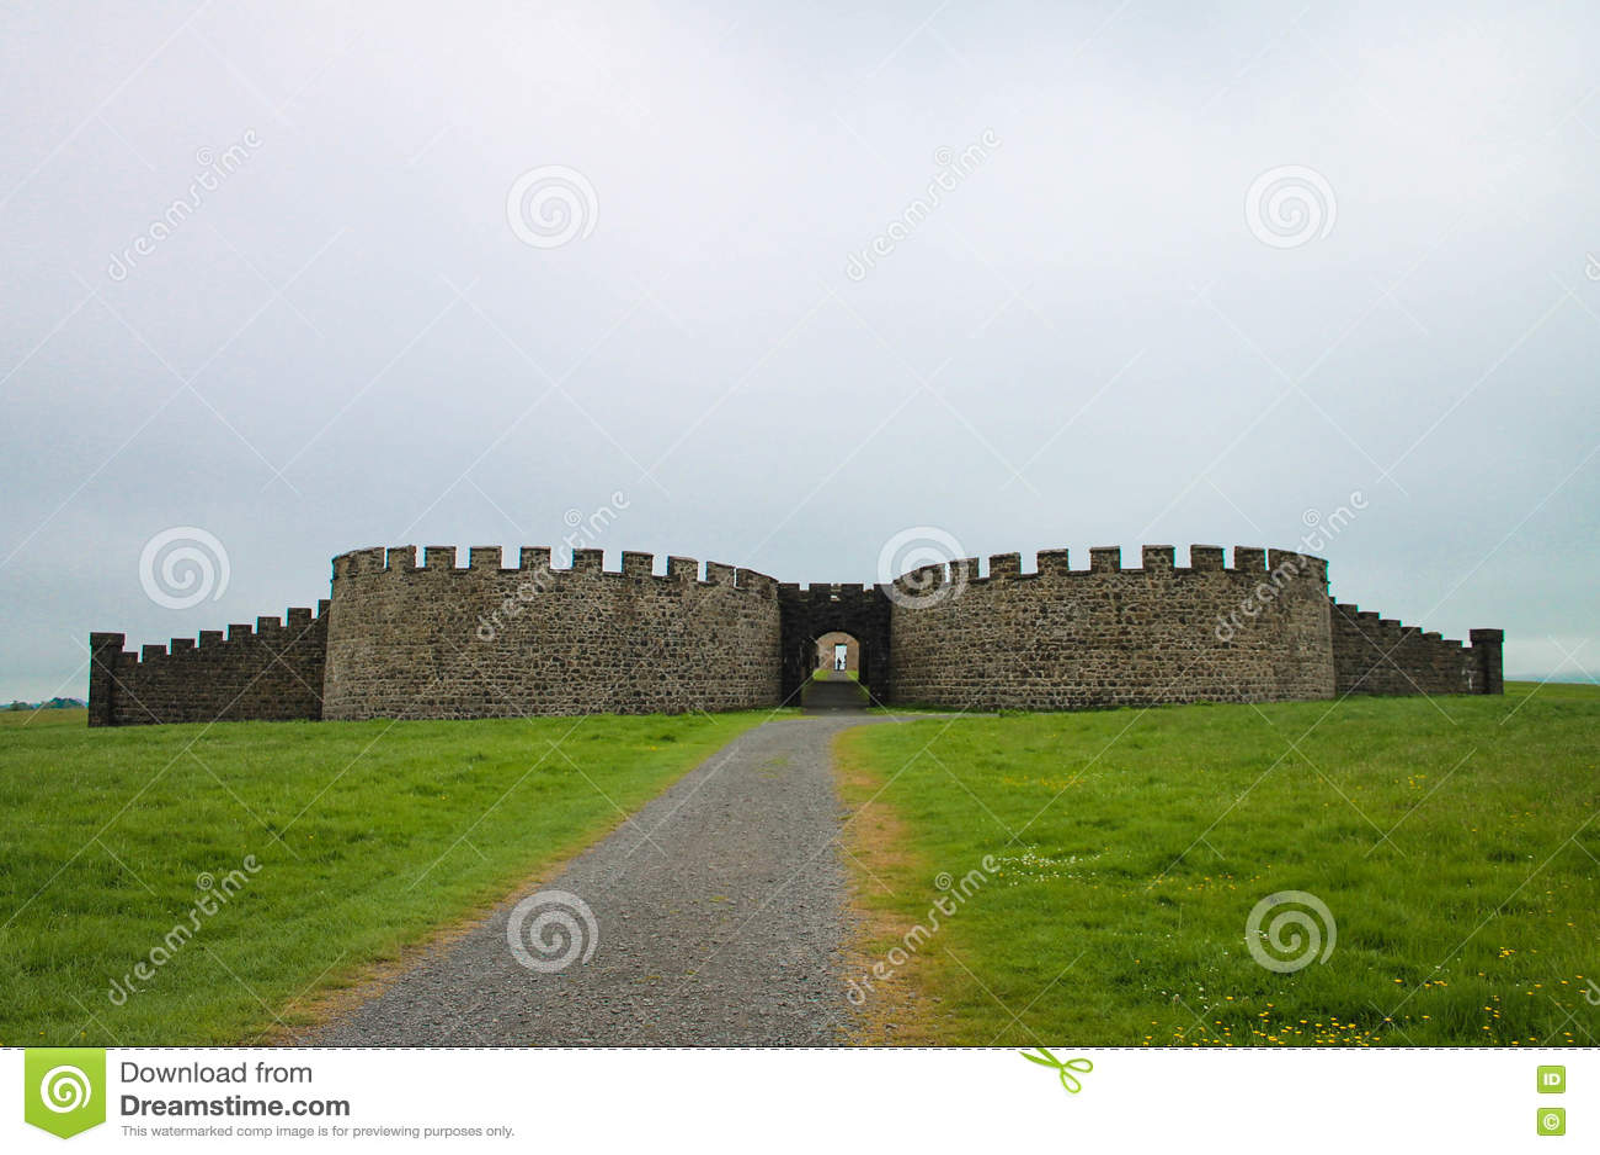 The Downhill House, Downhill Demesne and Hezlett House, Castlerock, Northern Ireland